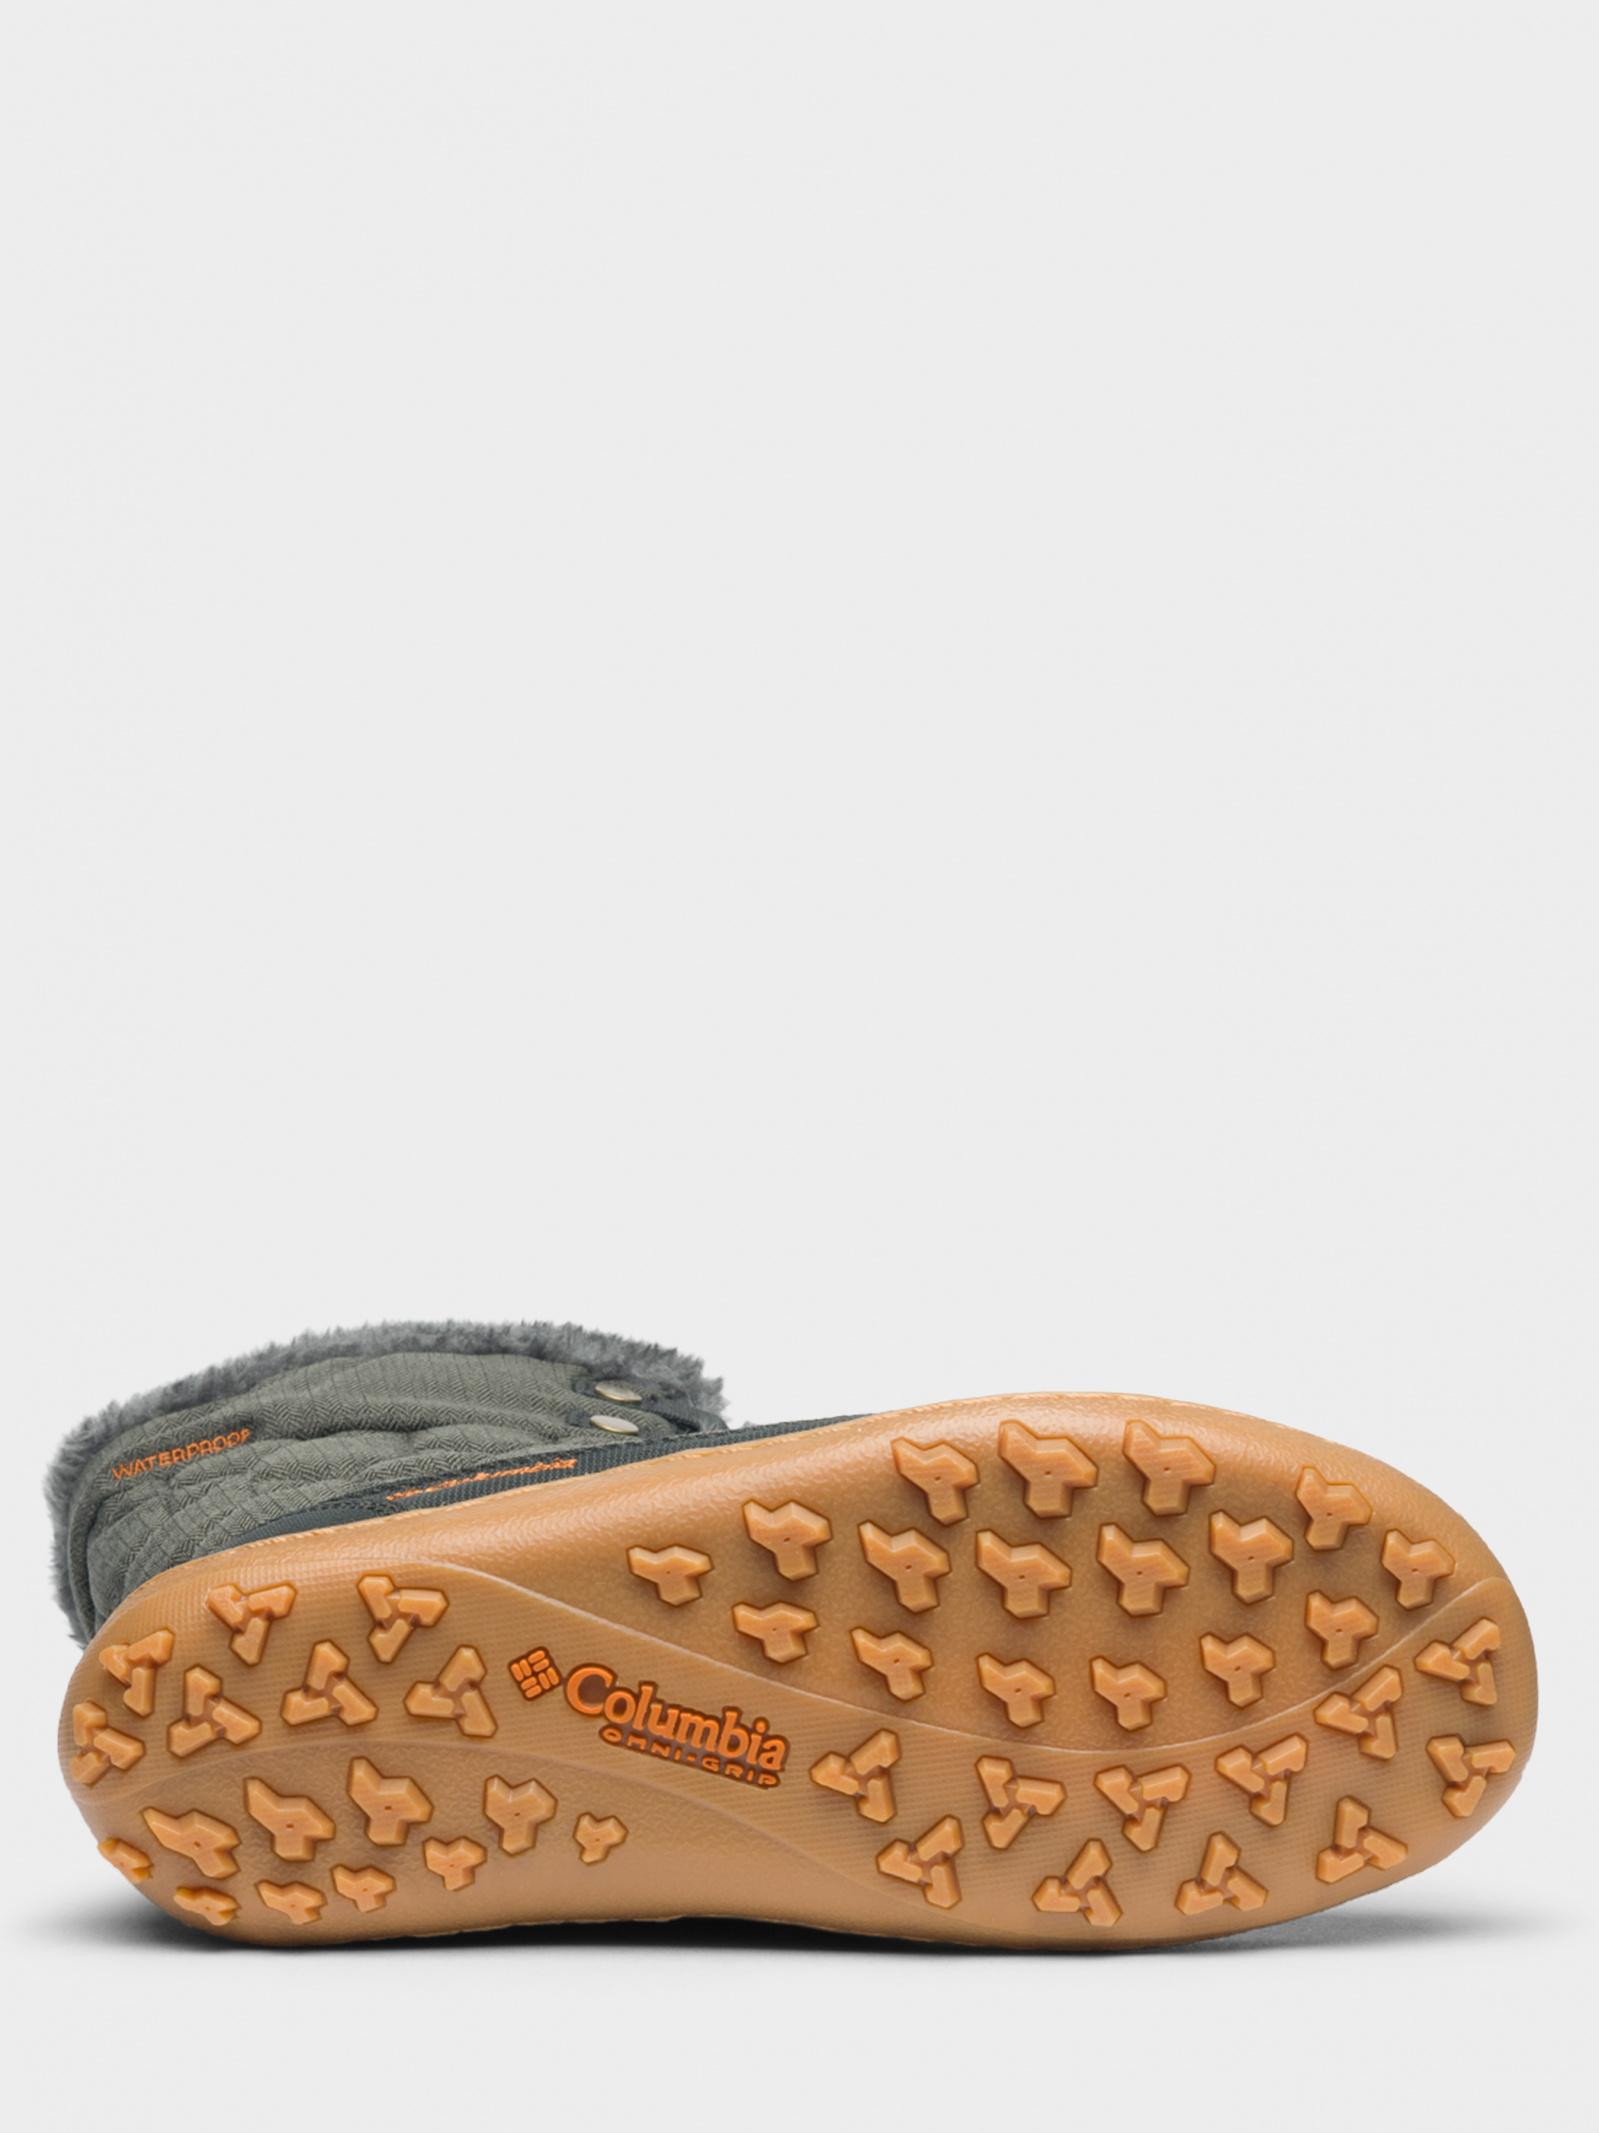 Сапоги женские Сапоги Columbia Minx Mid II Omni-Heat BL2757-383 BL2757-383 выбрать, 2017